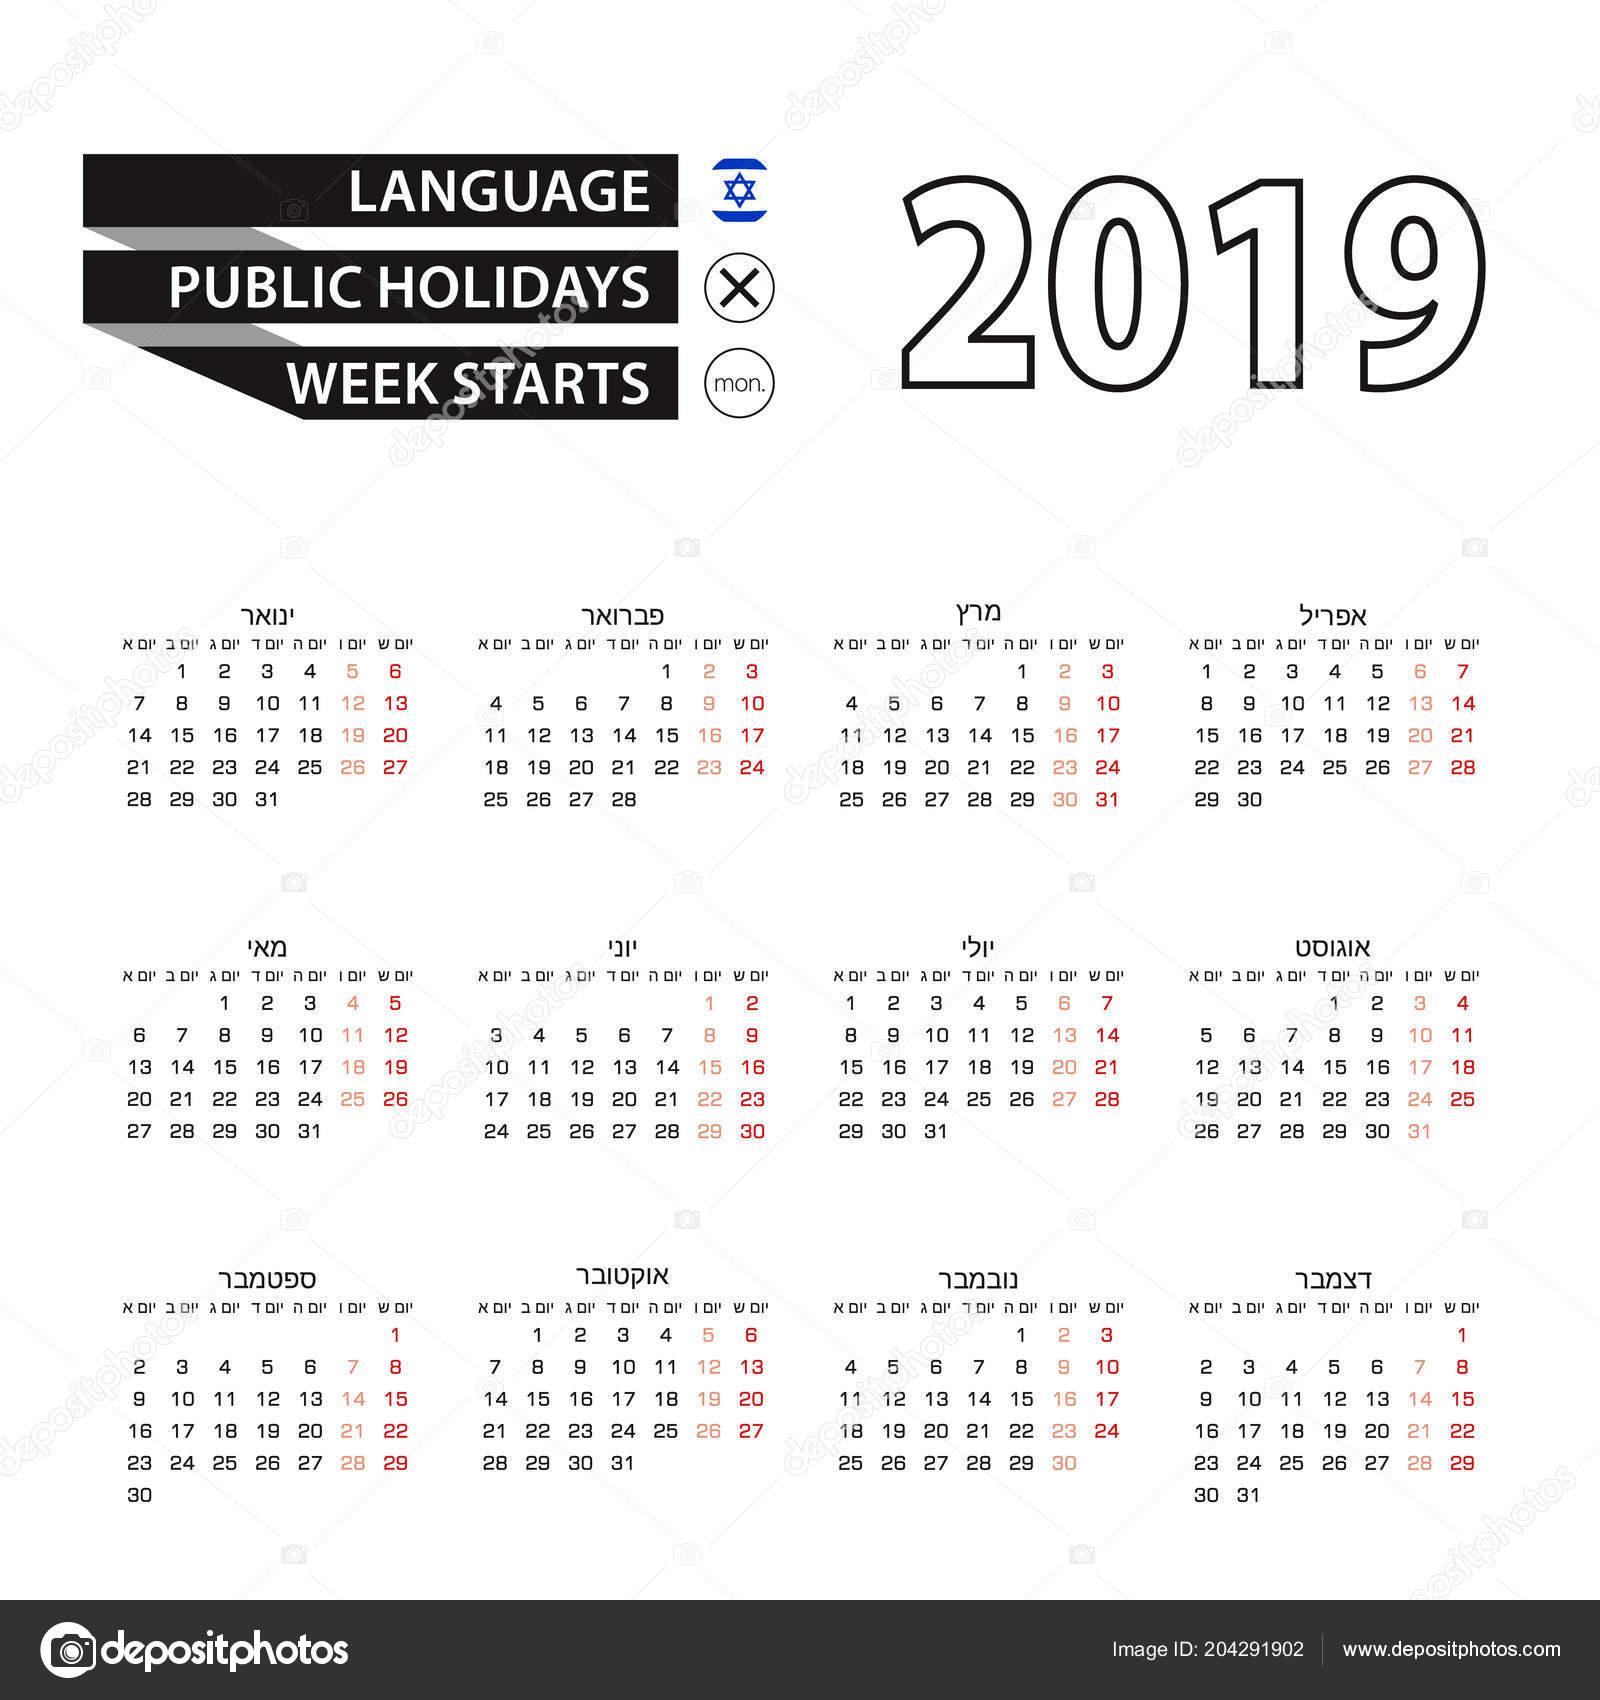 Calendrier Hebreu.Calendrier 2019 Langue Hebraique Semaine Commence Lundi